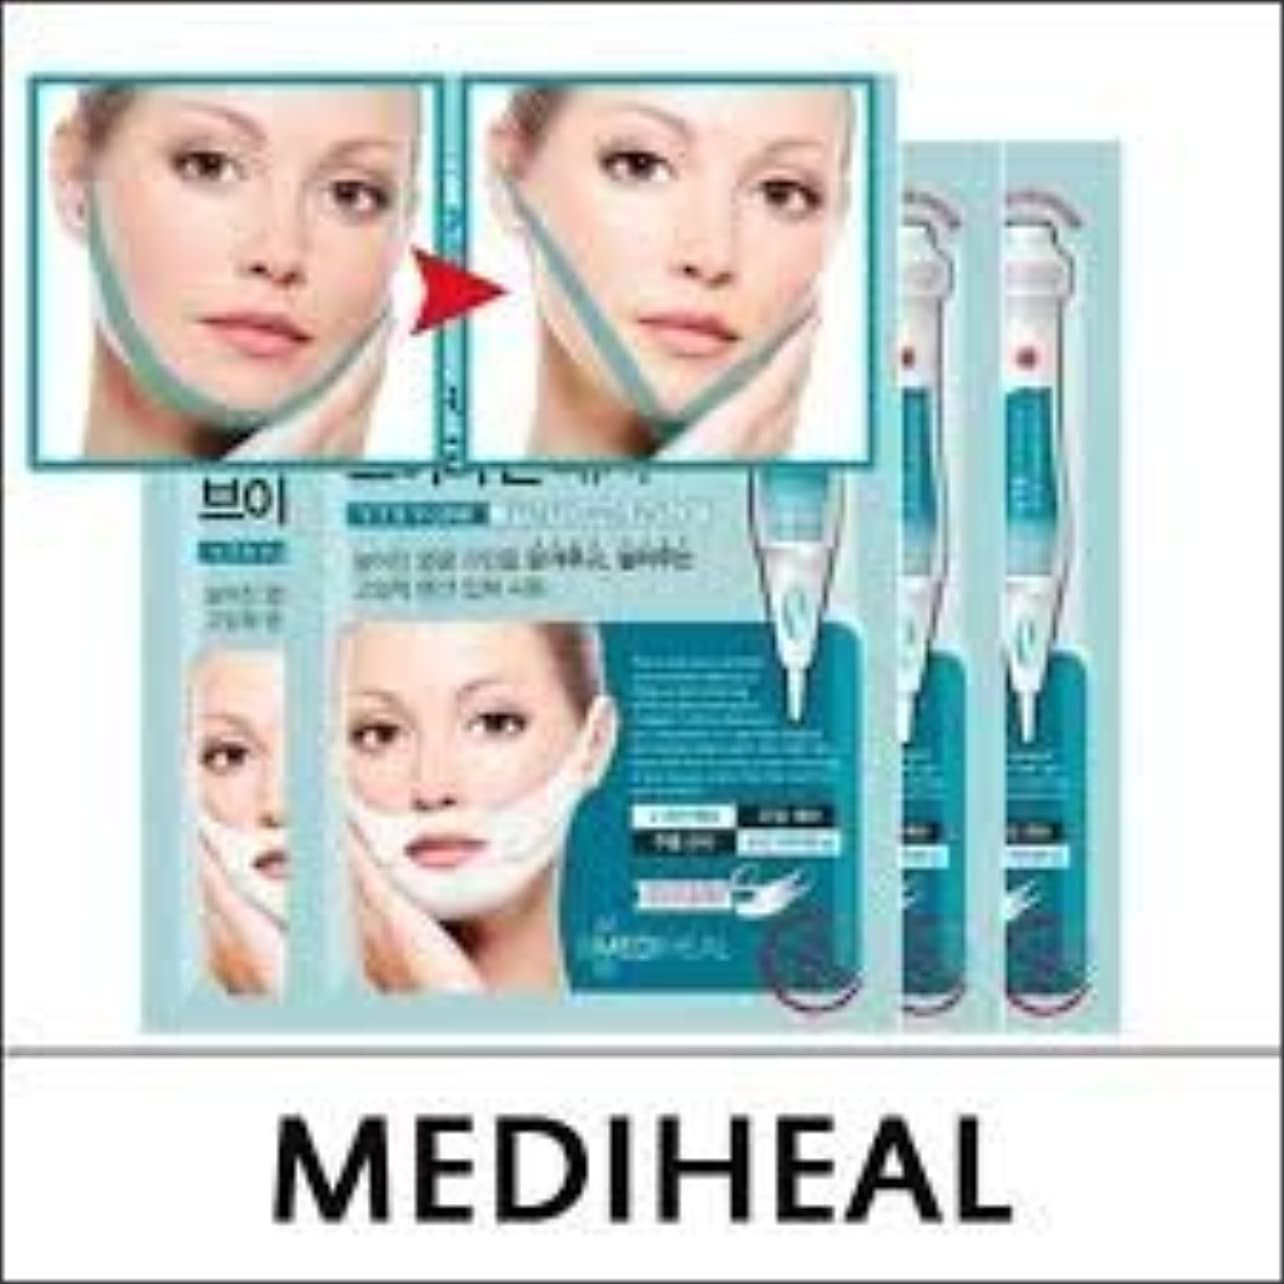 大統領運命民兵MEDIHEAL VTR V Stretching Patch 20mlX4pcs/A.R.P Neck Patch/100% Authentic Korea Cosmetic (VTR V-Line Stretching...